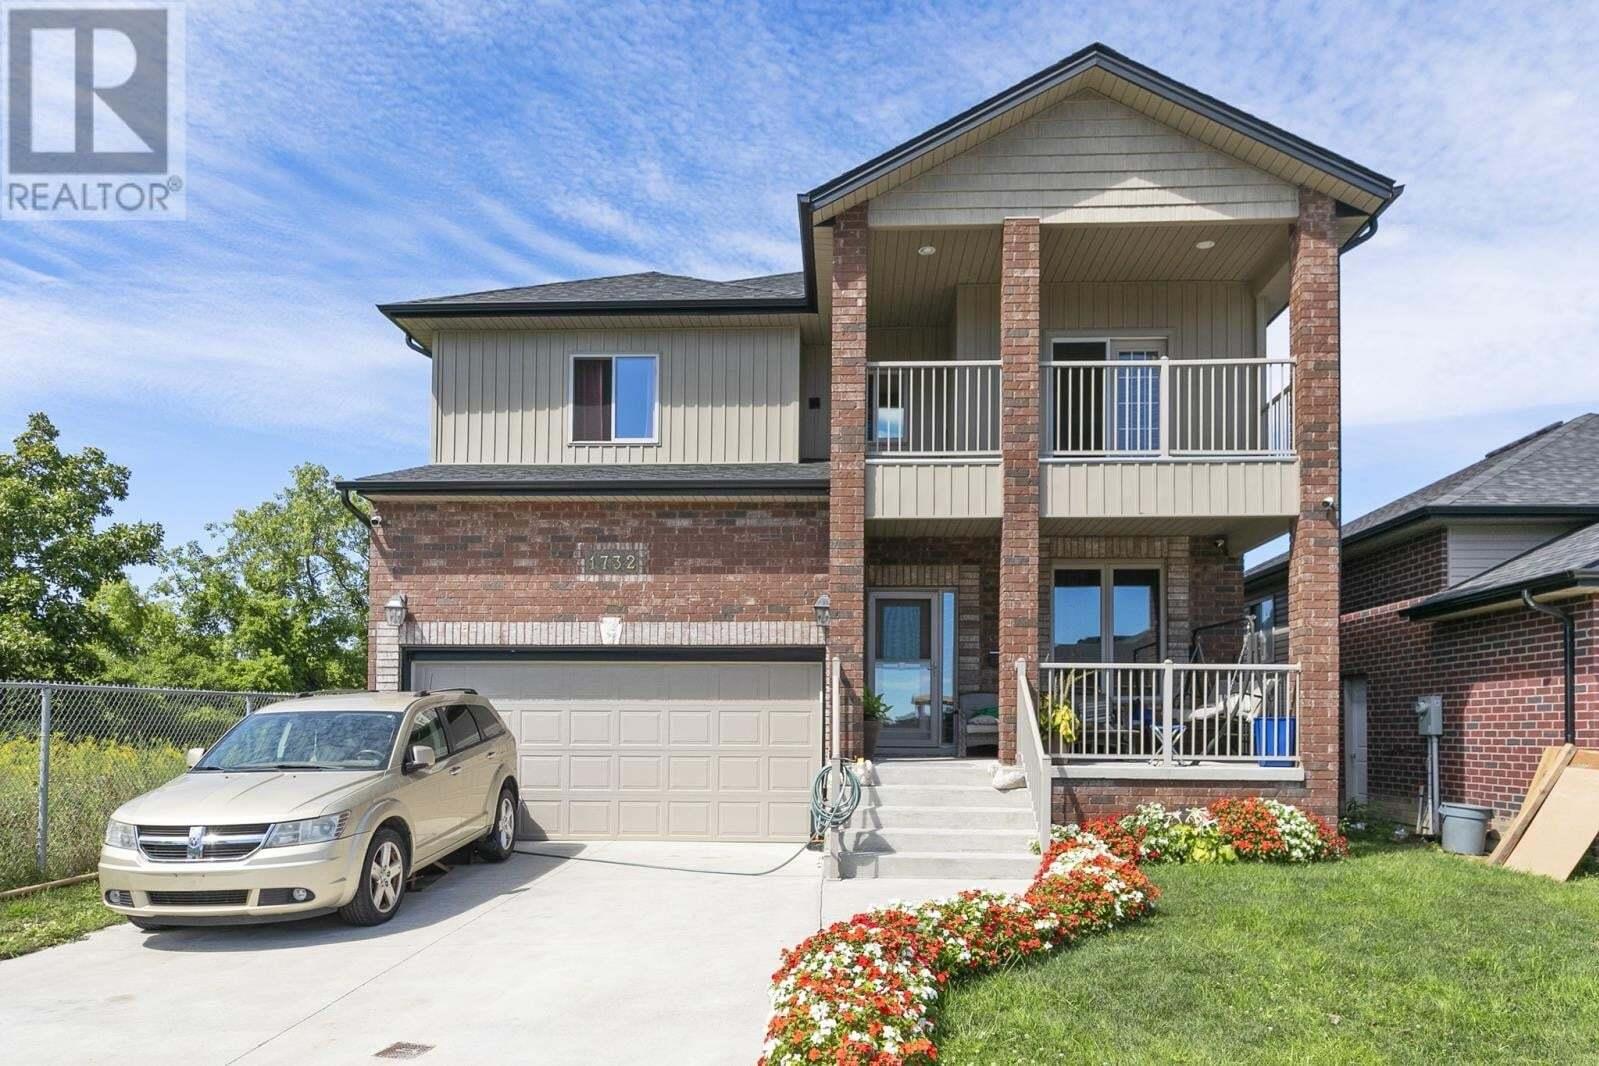 House for sale at 1732 Kenora St Windsor Ontario - MLS: 20011314